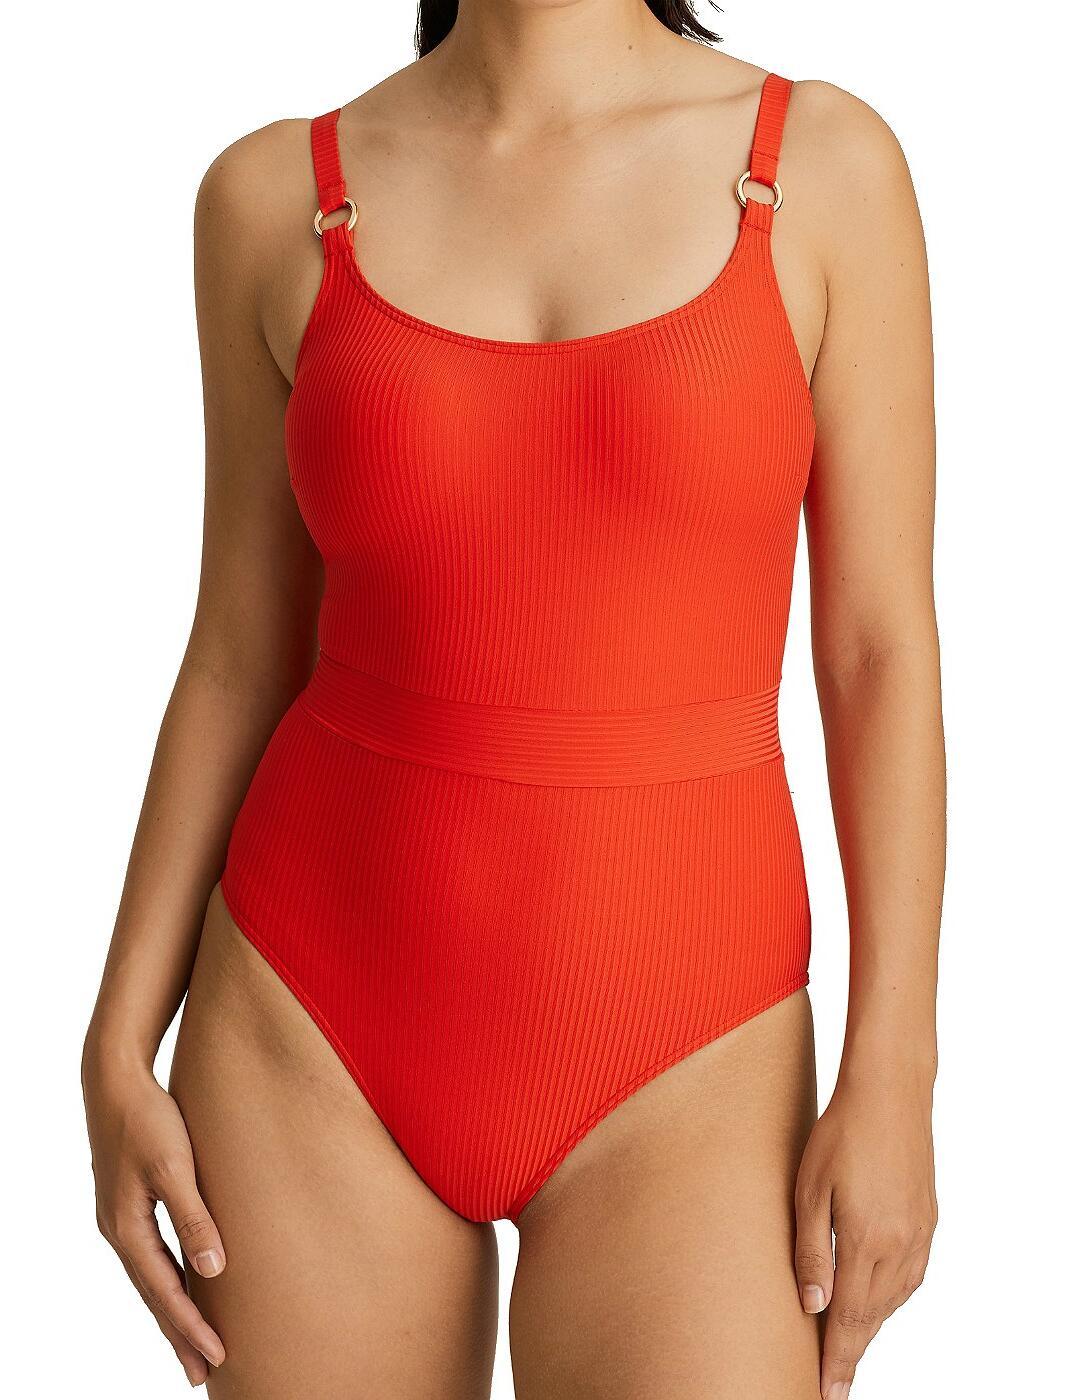 4006338 Prima Donna Swim Sahara Padded Swimsuit - 4006338 Red Pepper